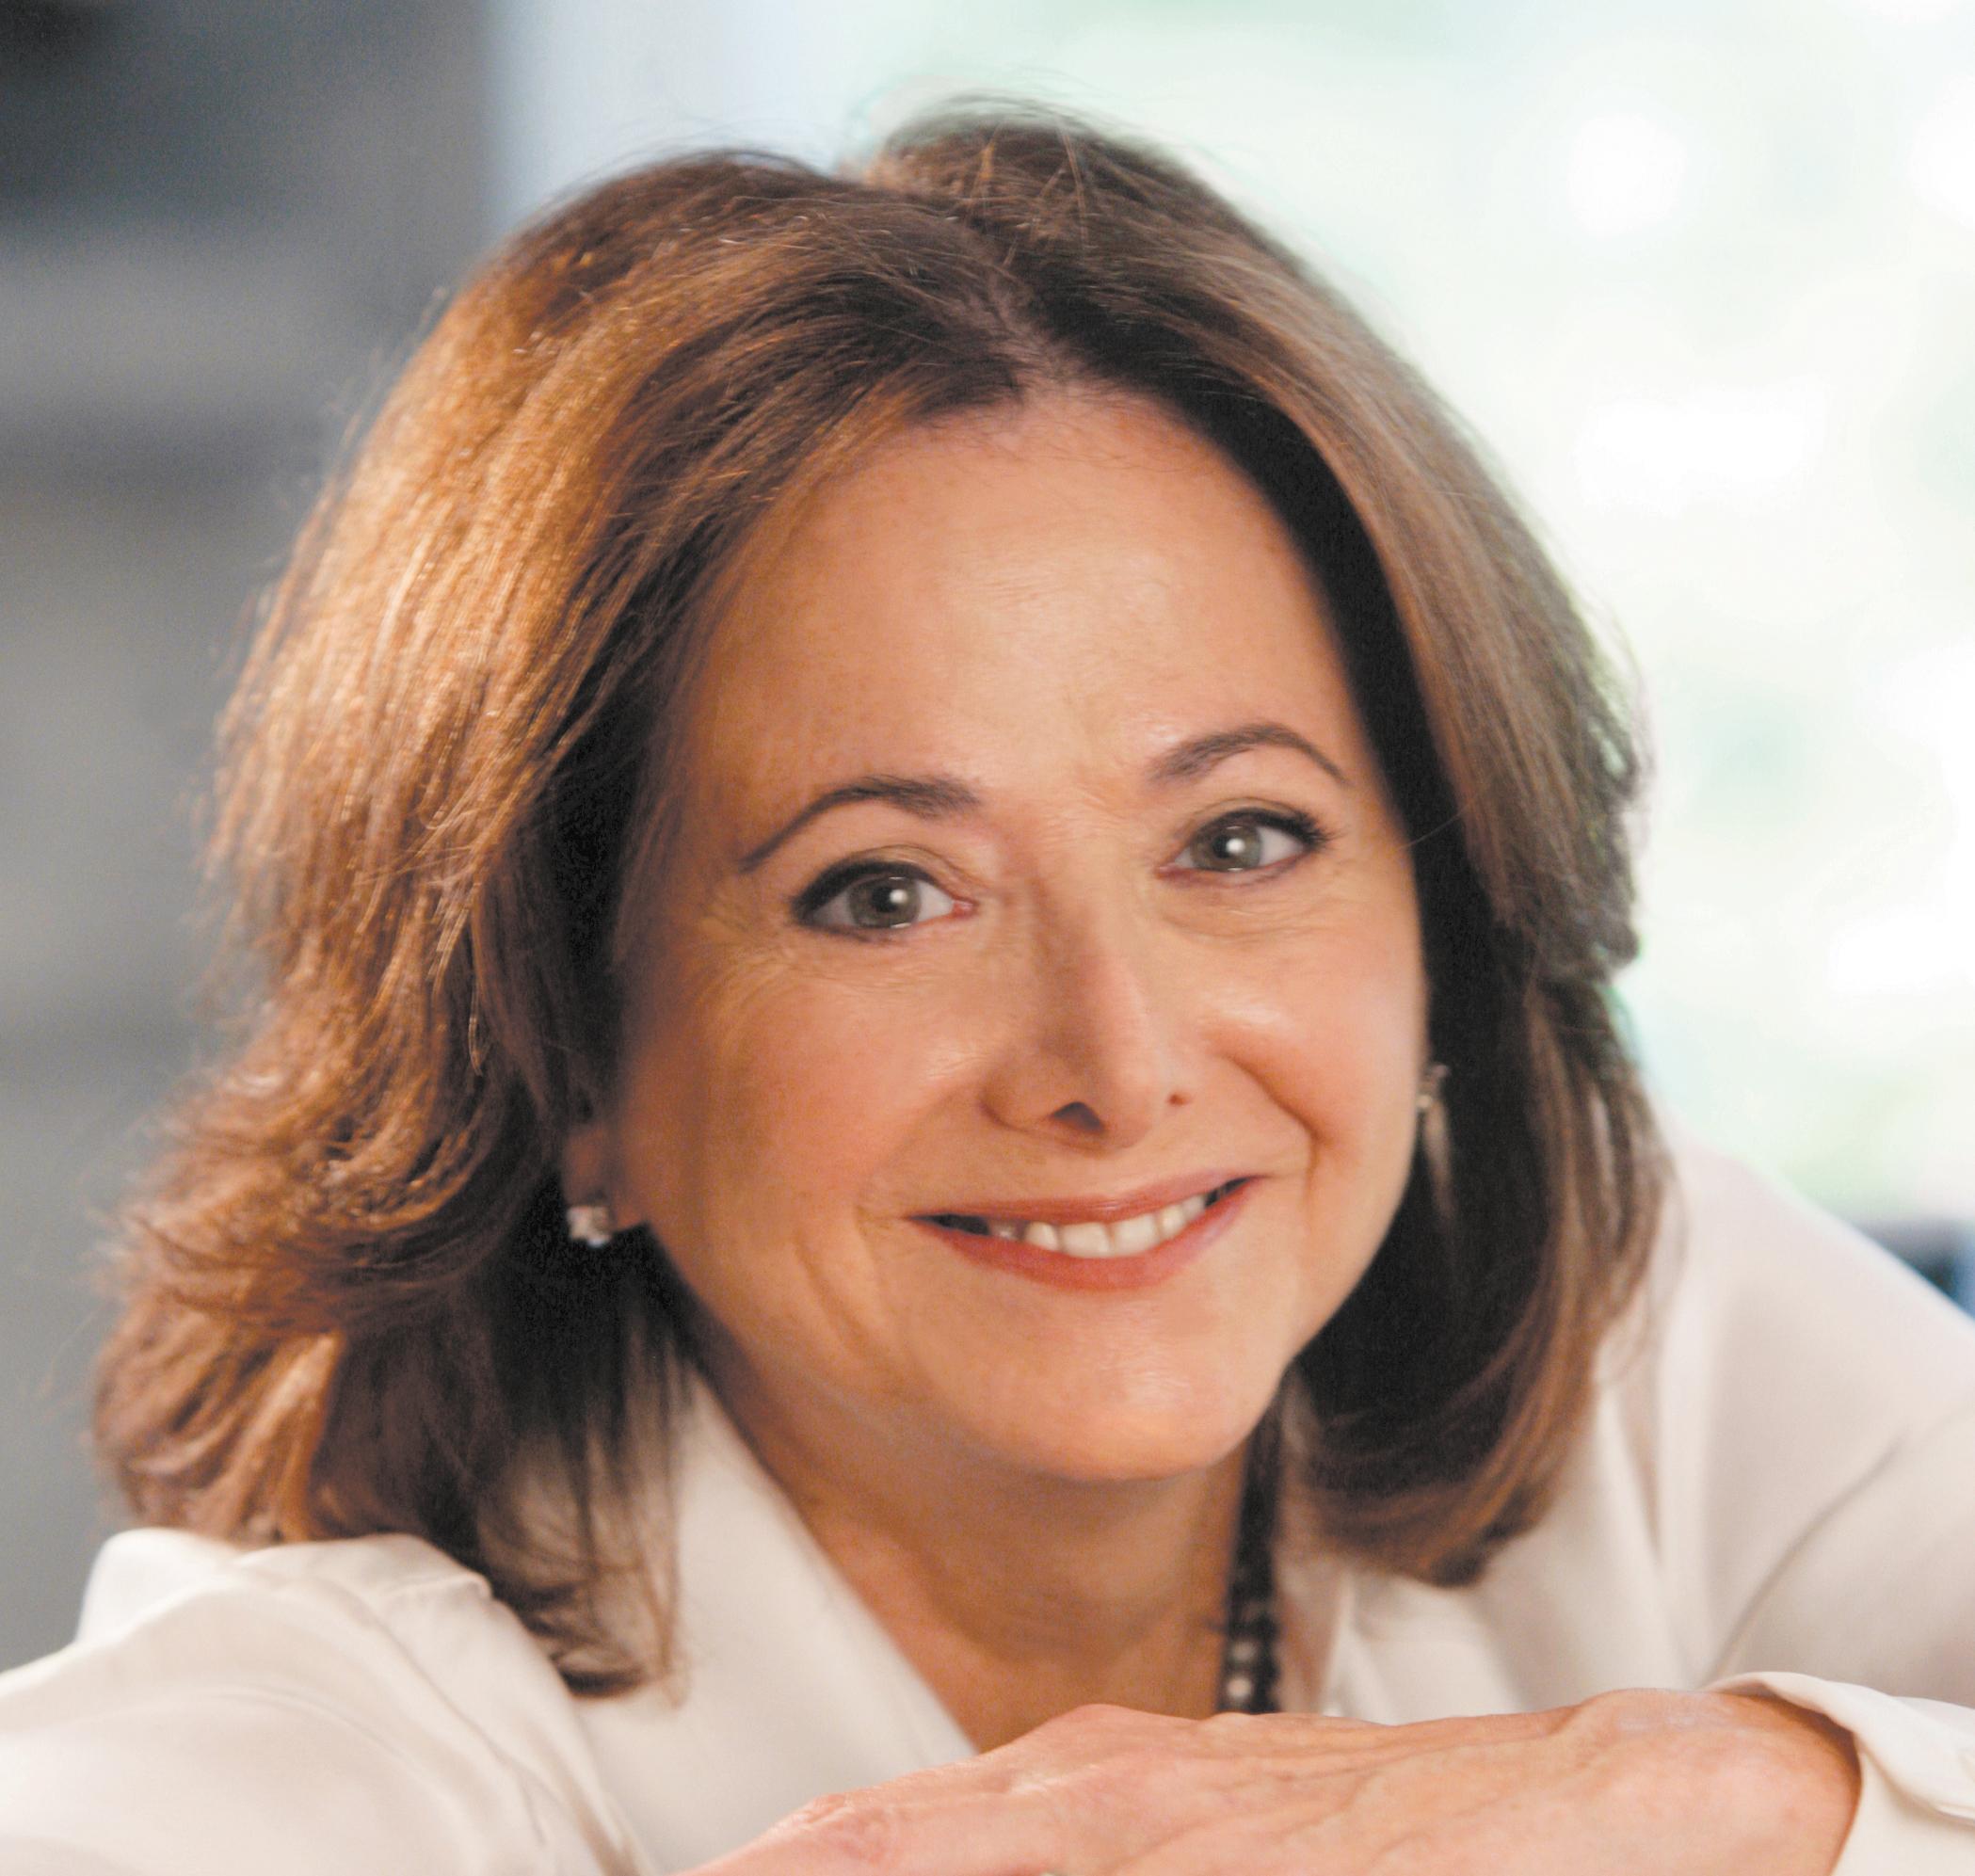 8_14_2012 -- Westbrook Judge Elaine Gordon